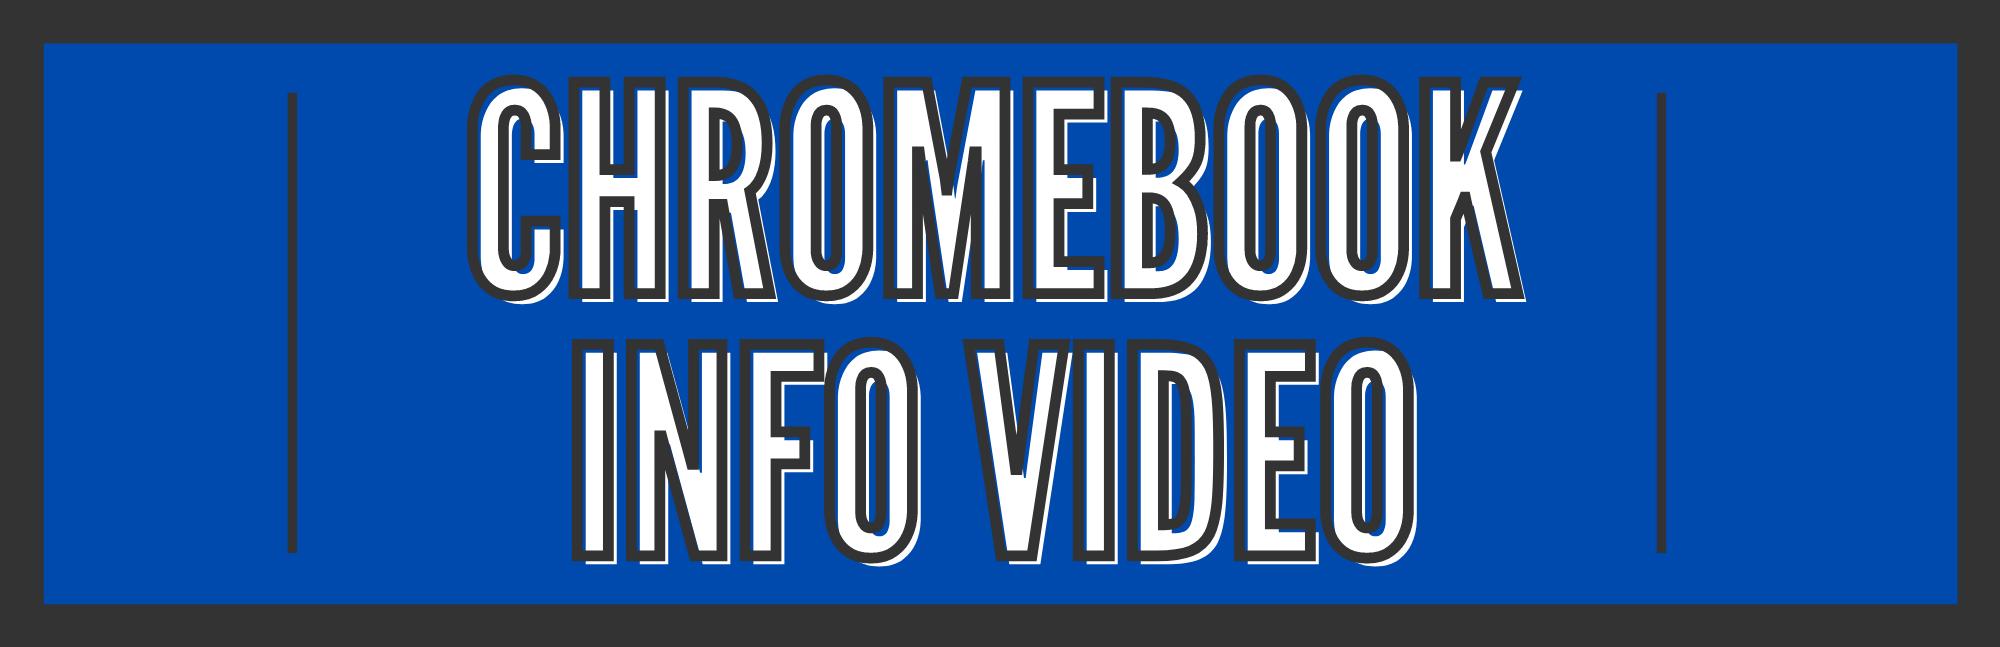 Chromebook video